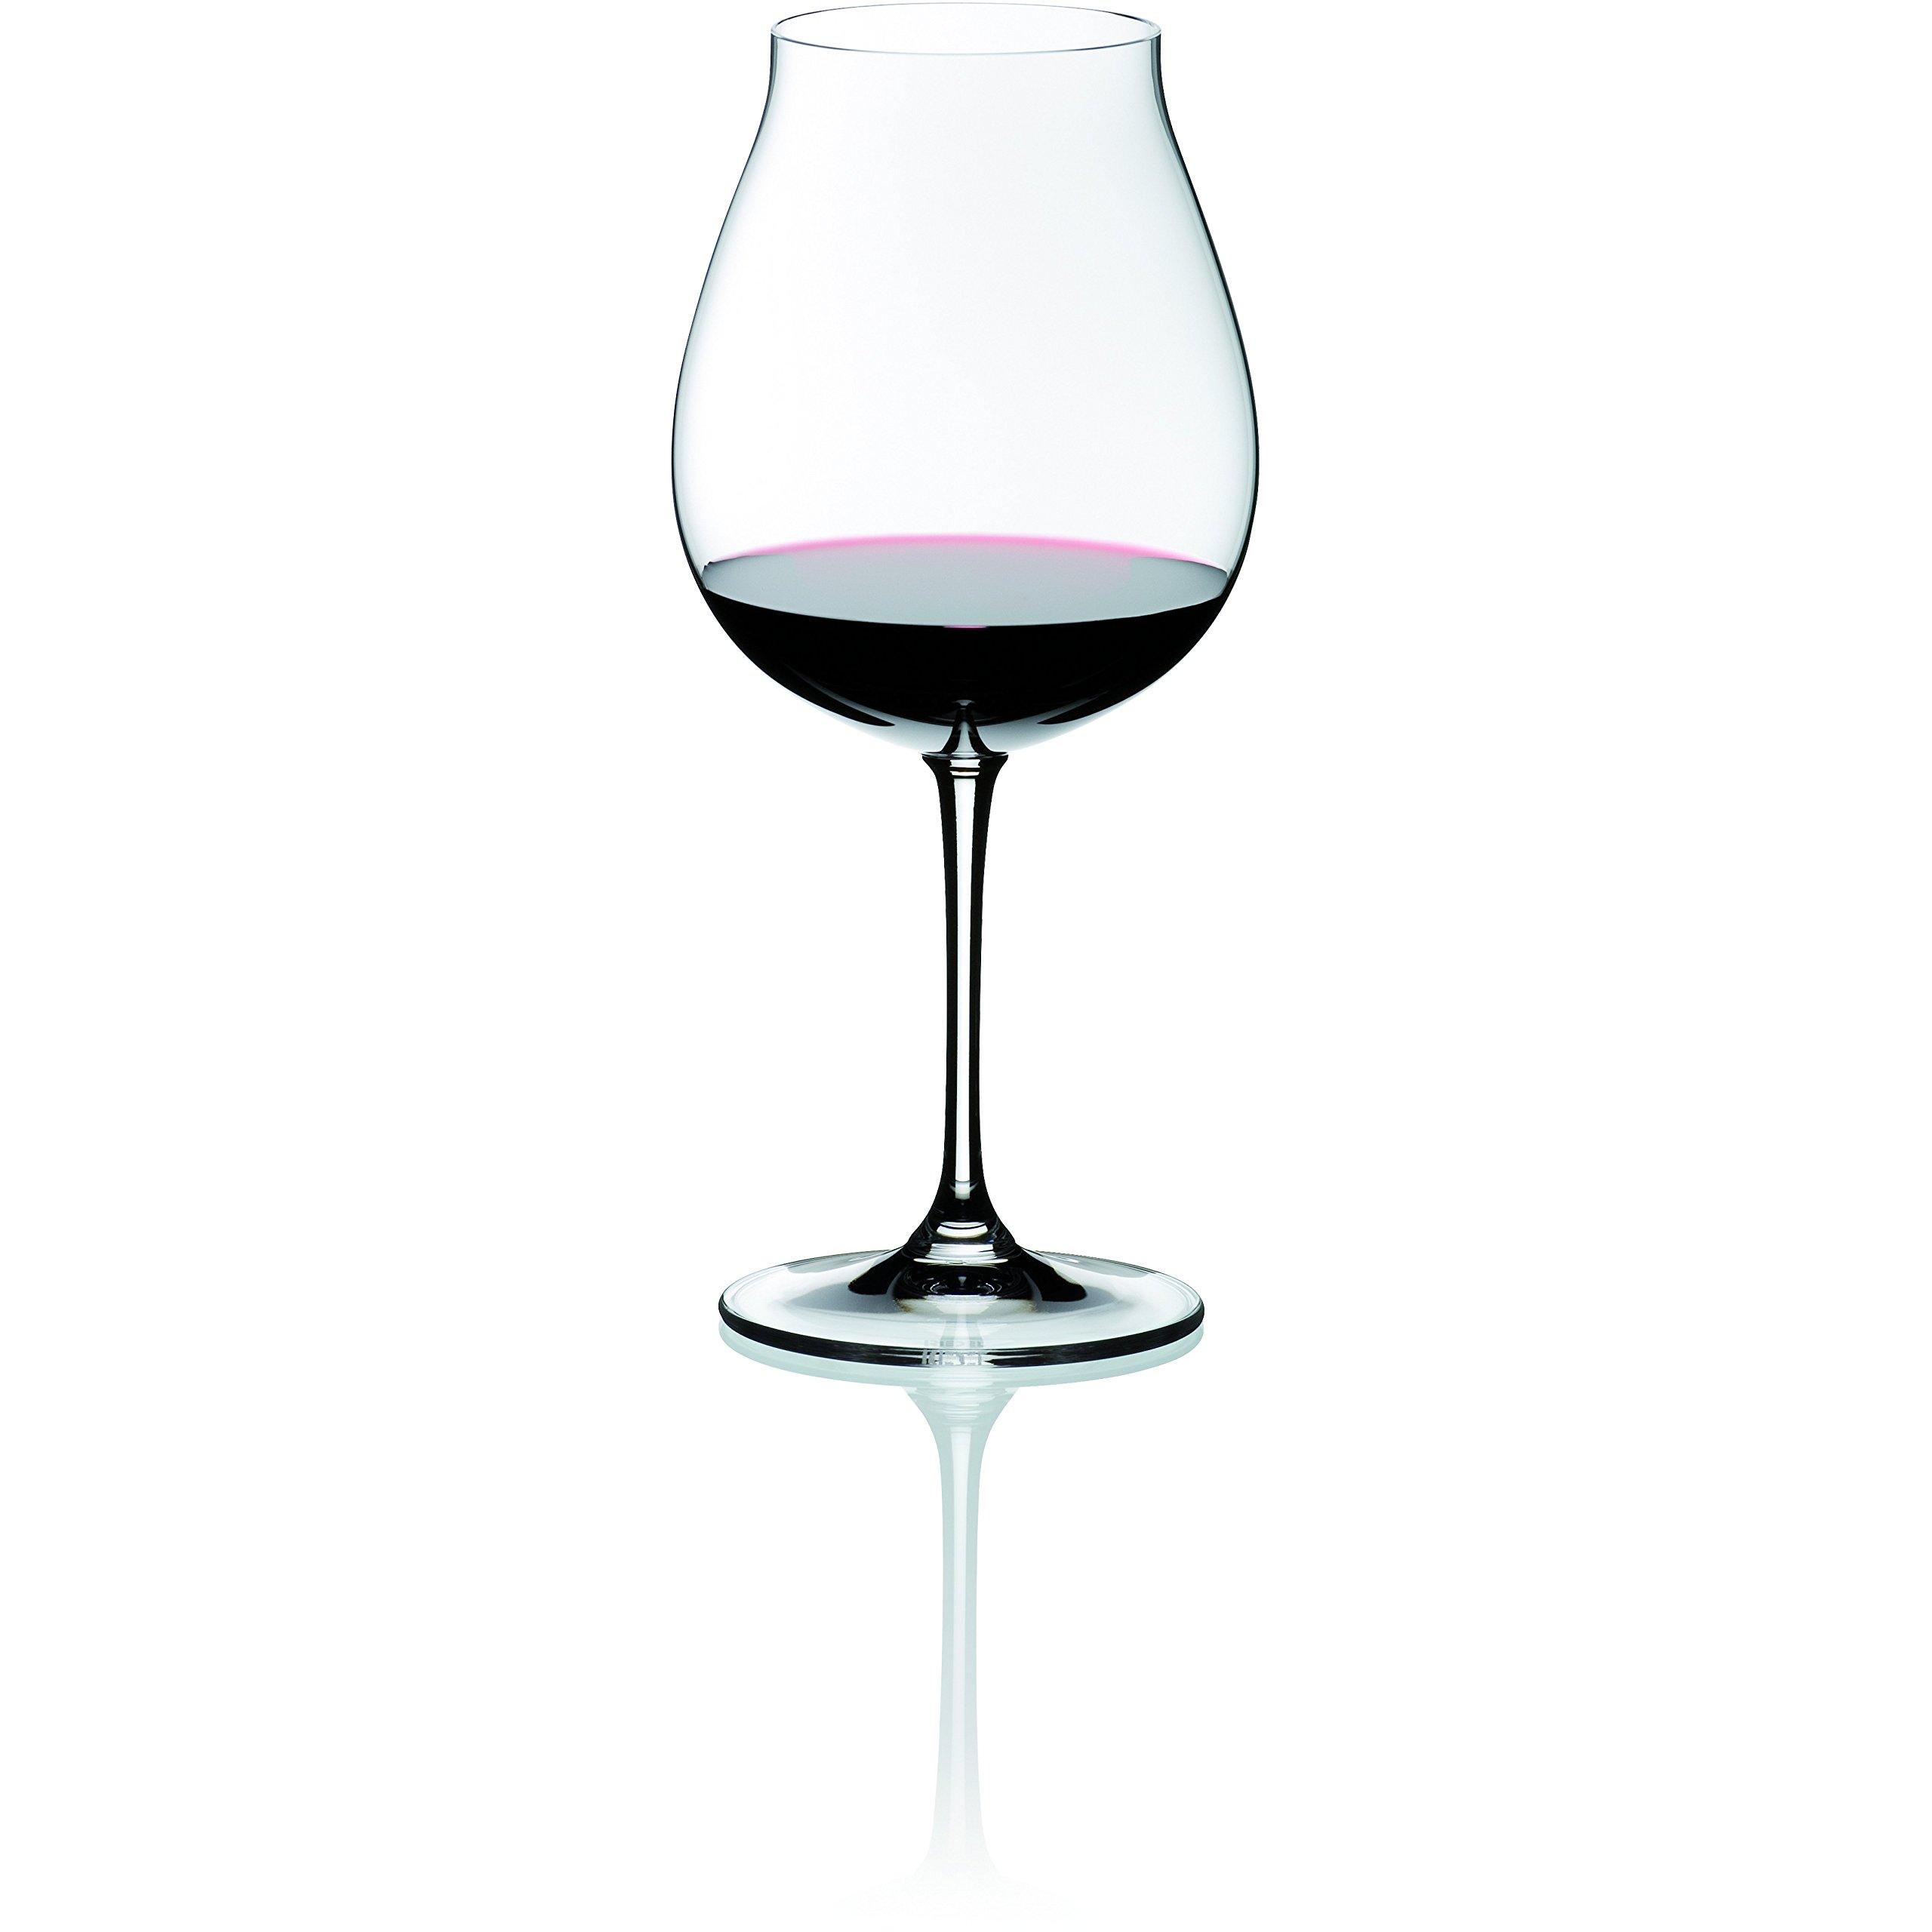 Riedel Vinum XL Leaded Crystal Pinot Noir Wine Glass Set, Buy 6 Get 8